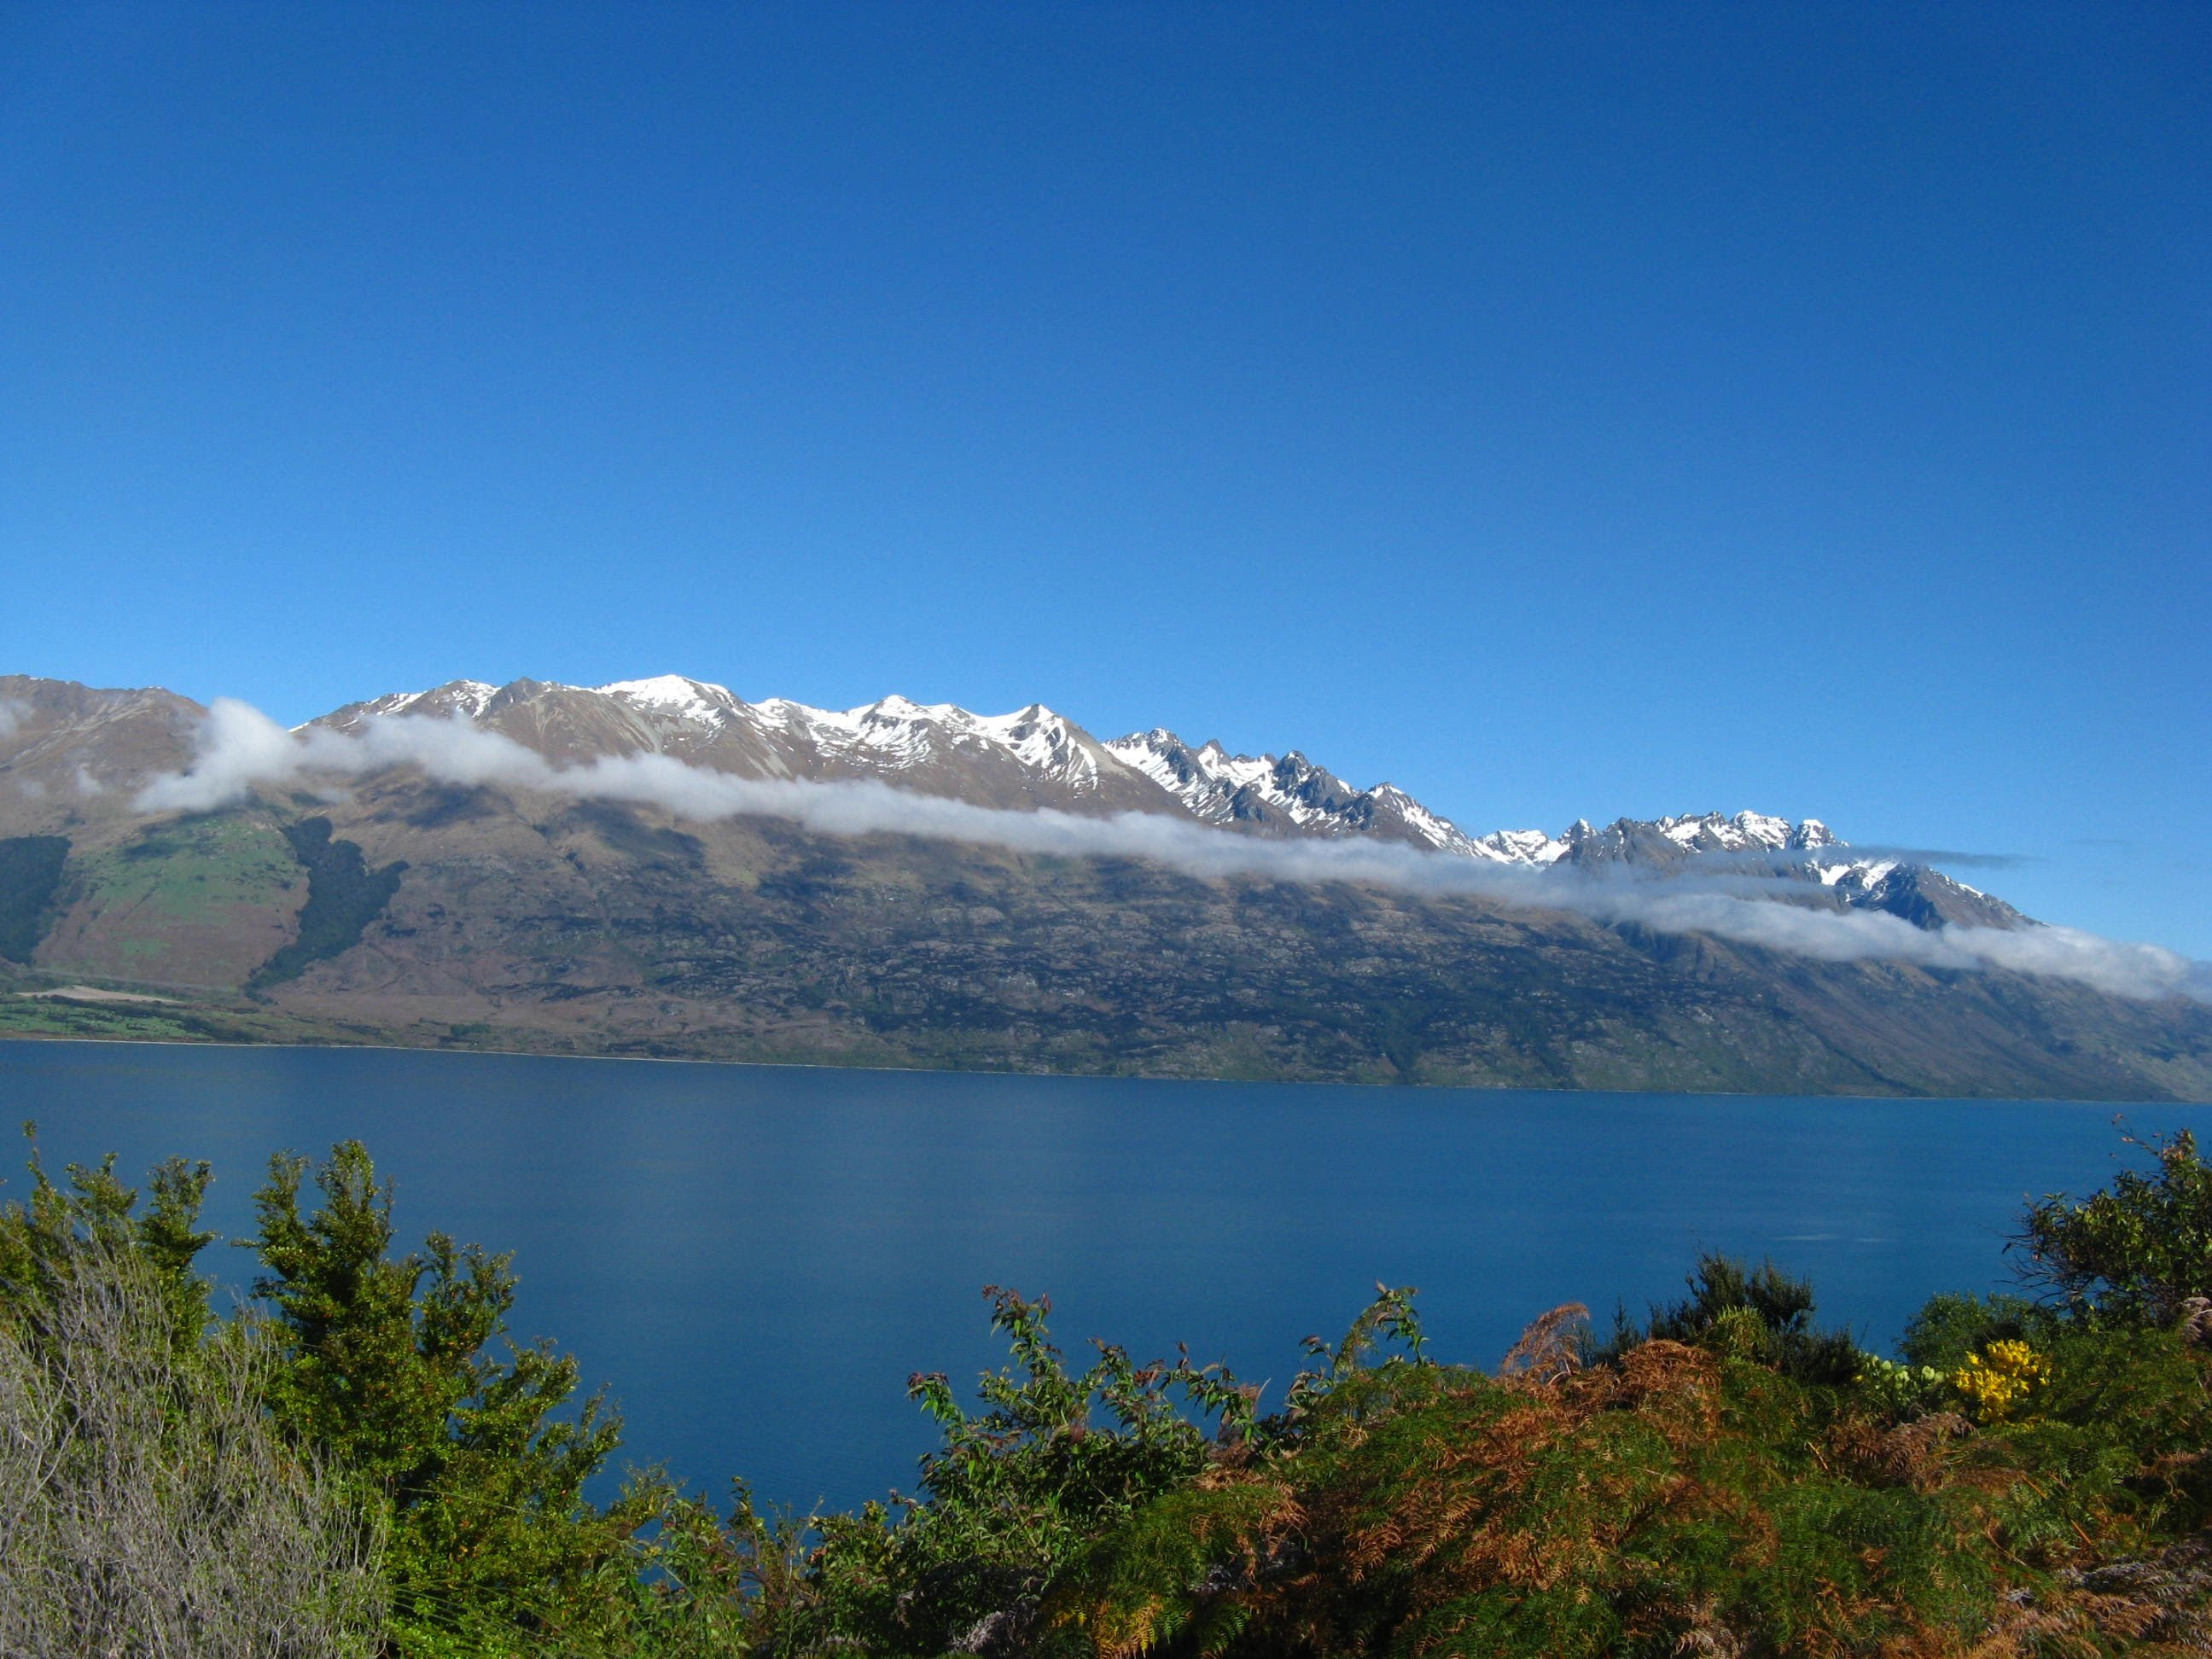 New Zealand Itinerary 紐西蘭行程規劃 – 路過筆記